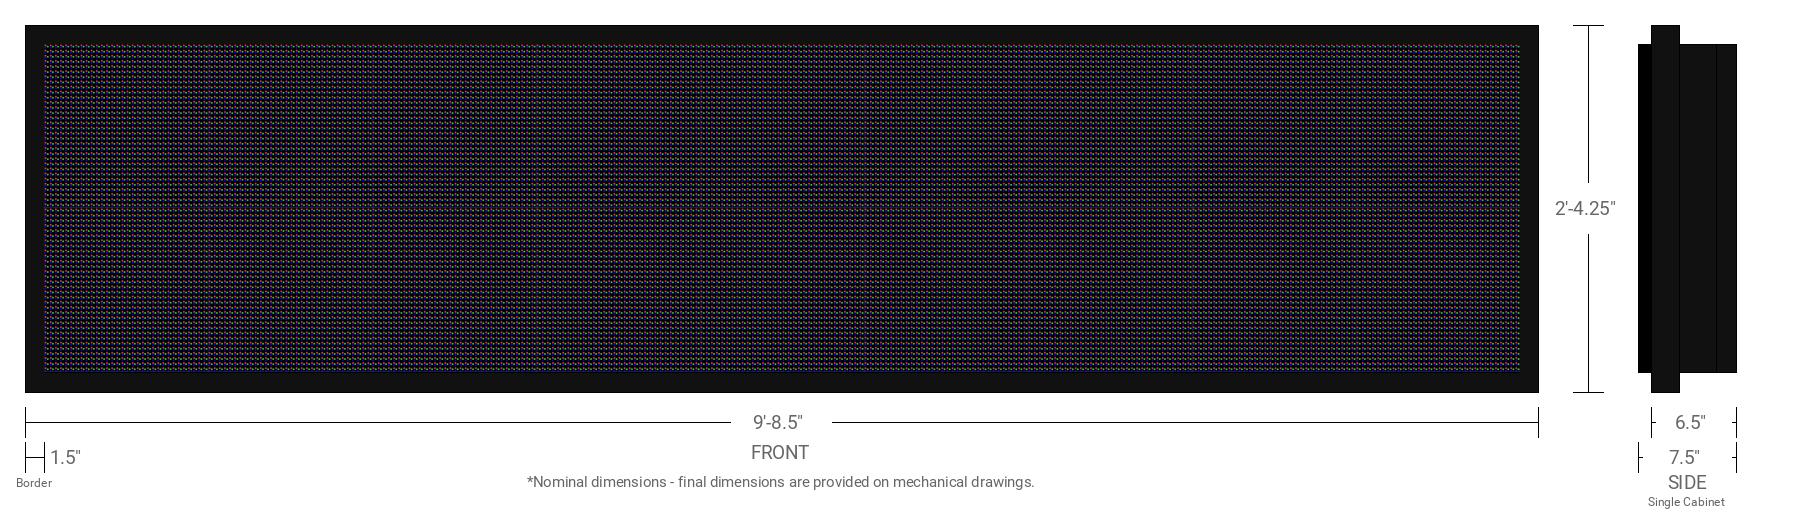 Aurora 10mm 64x288 Single Sided Full Color LED Display